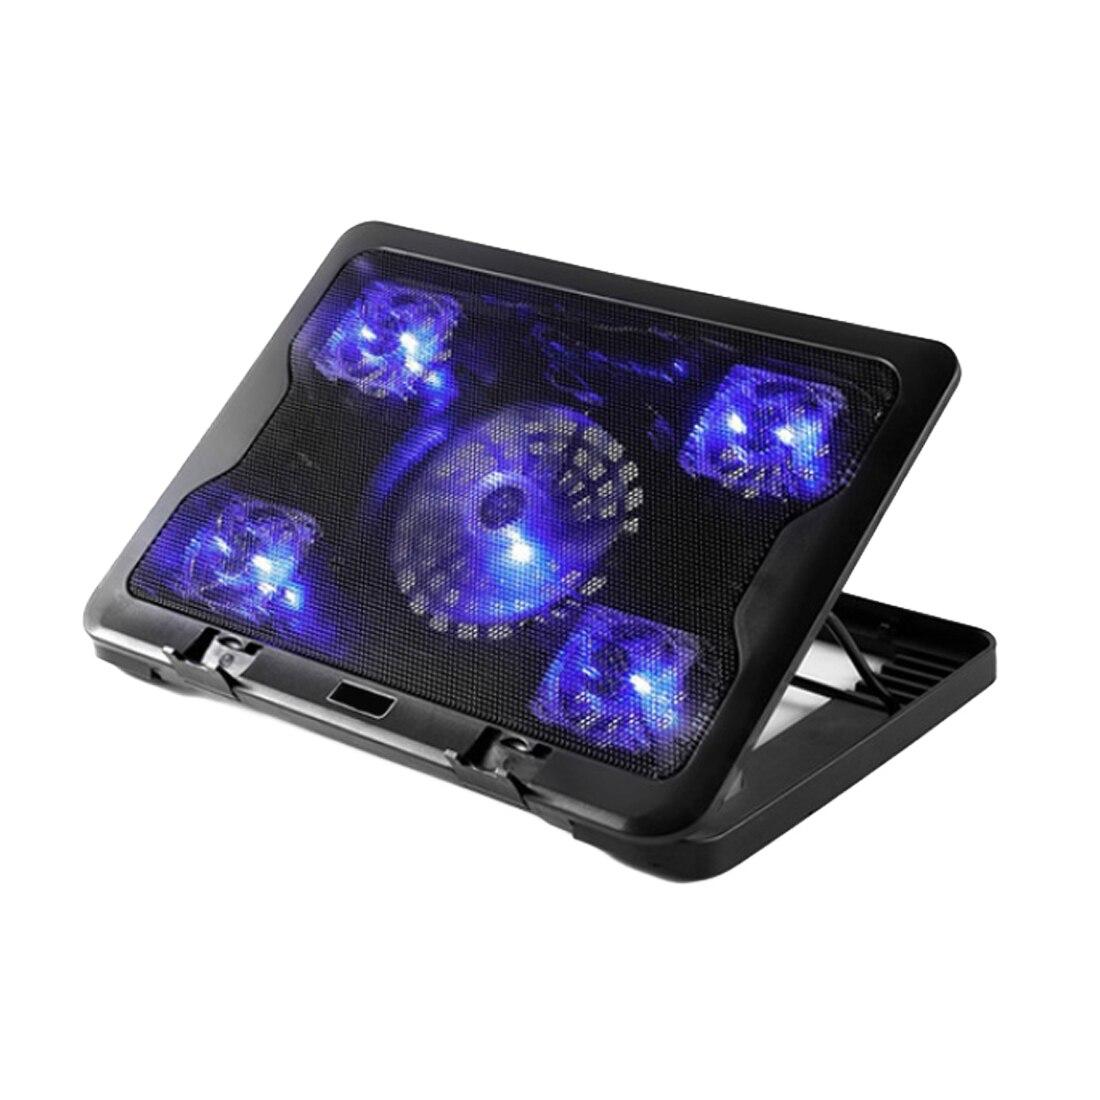 NOYOKERE marca 5 ventilador 2 portátil USB Cooler Pad Base LED Notebook Cooler USB del ordenador soporte para portátil juegos de PC 10-17